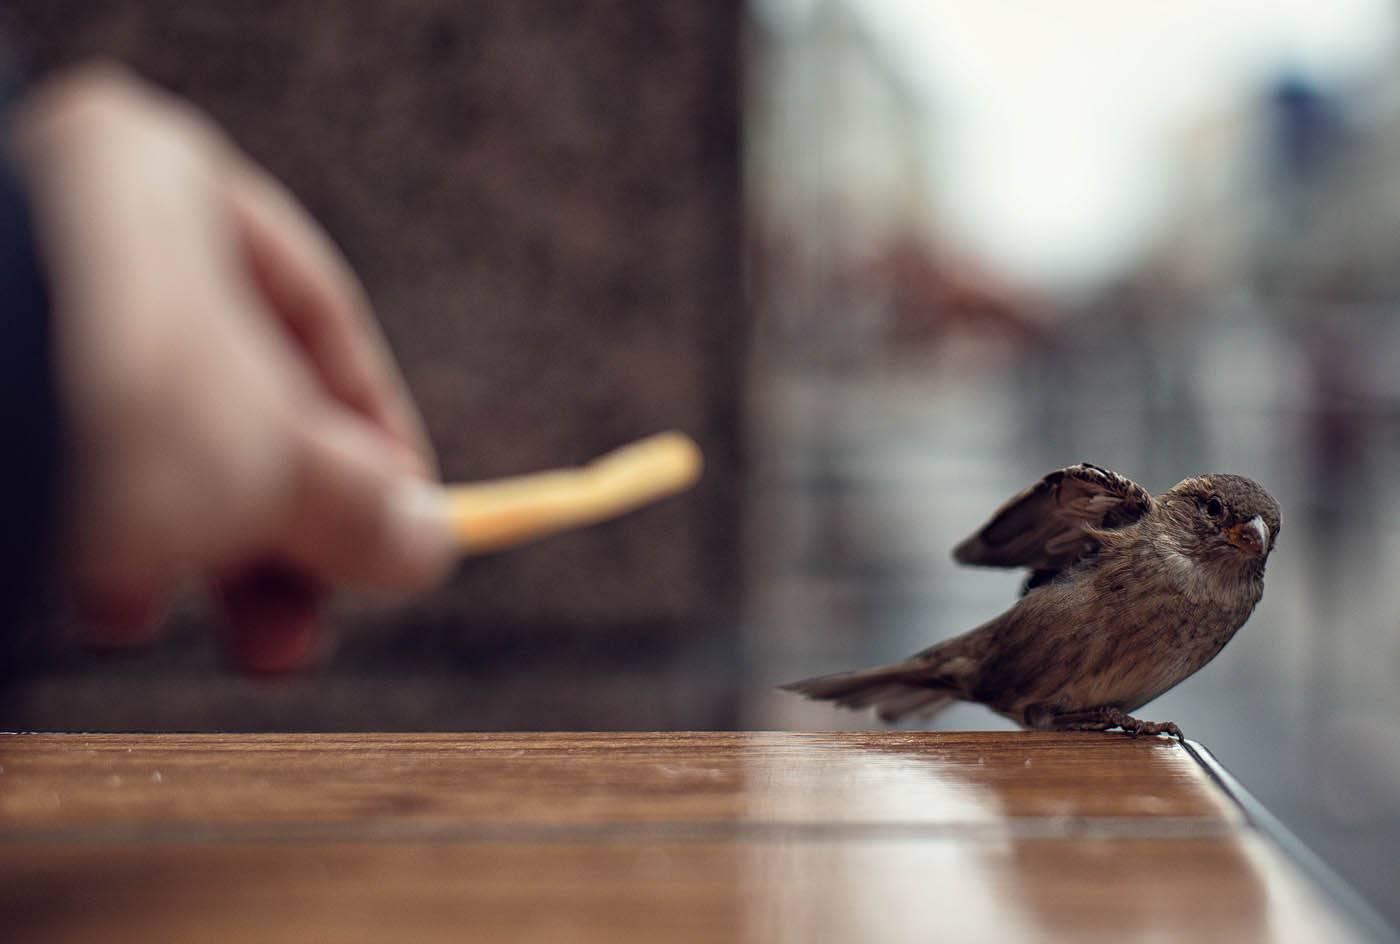 Птица залетела в дом через окно или балкон: примета